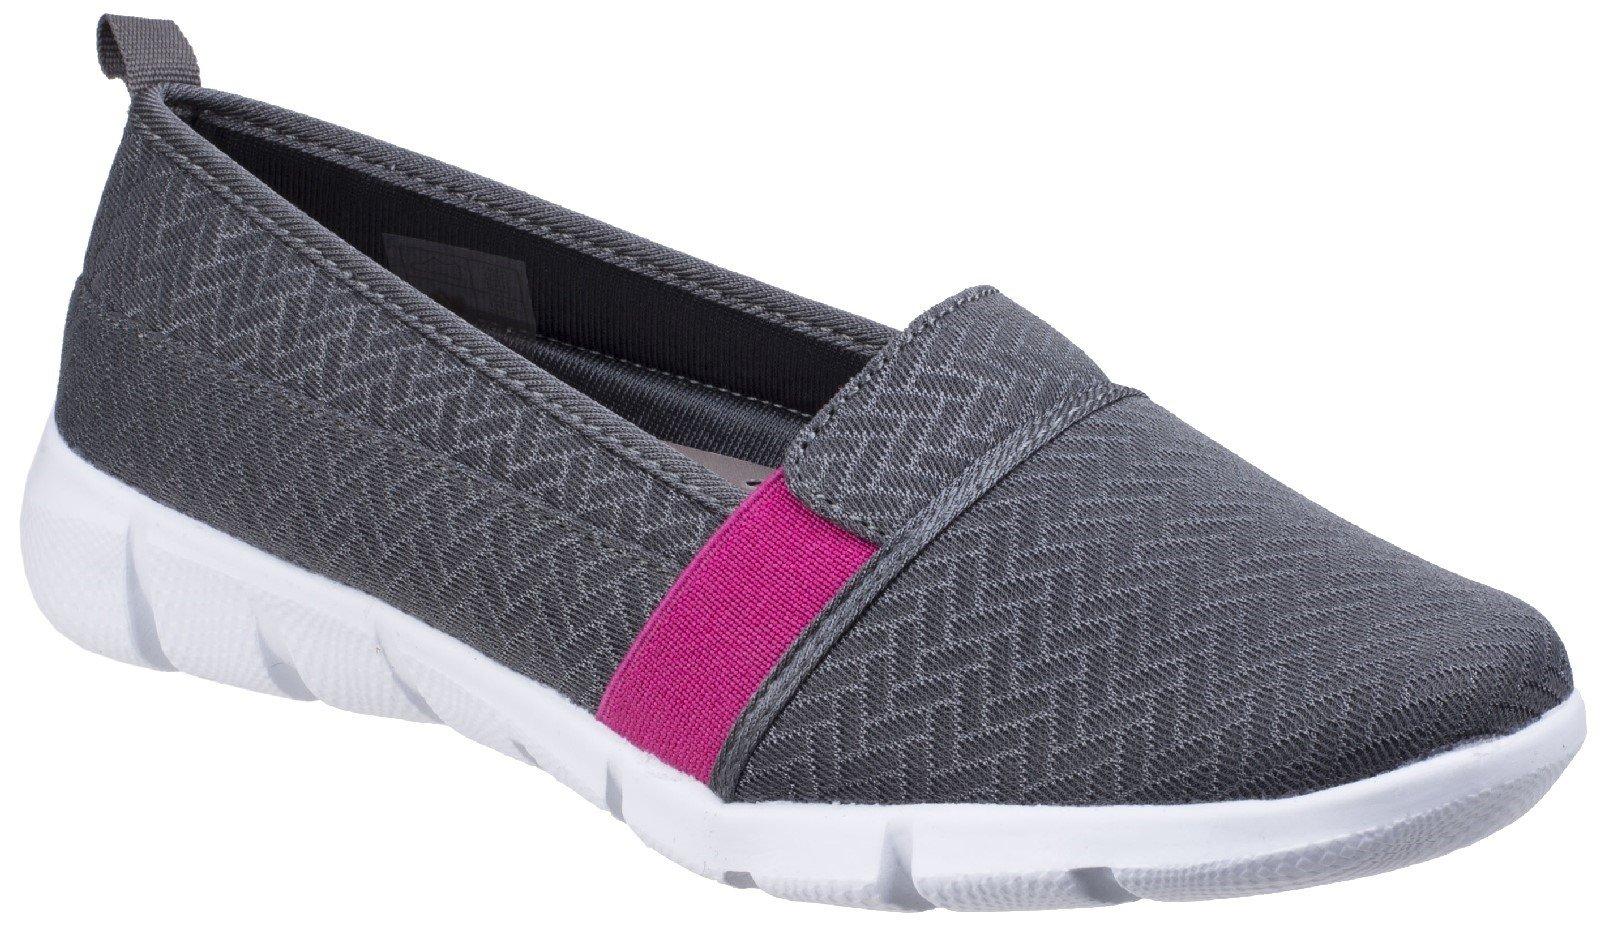 Fleet & Foster Women's Canary Espadrilles Shoe Various Colours 26310-43913 - Grey 5